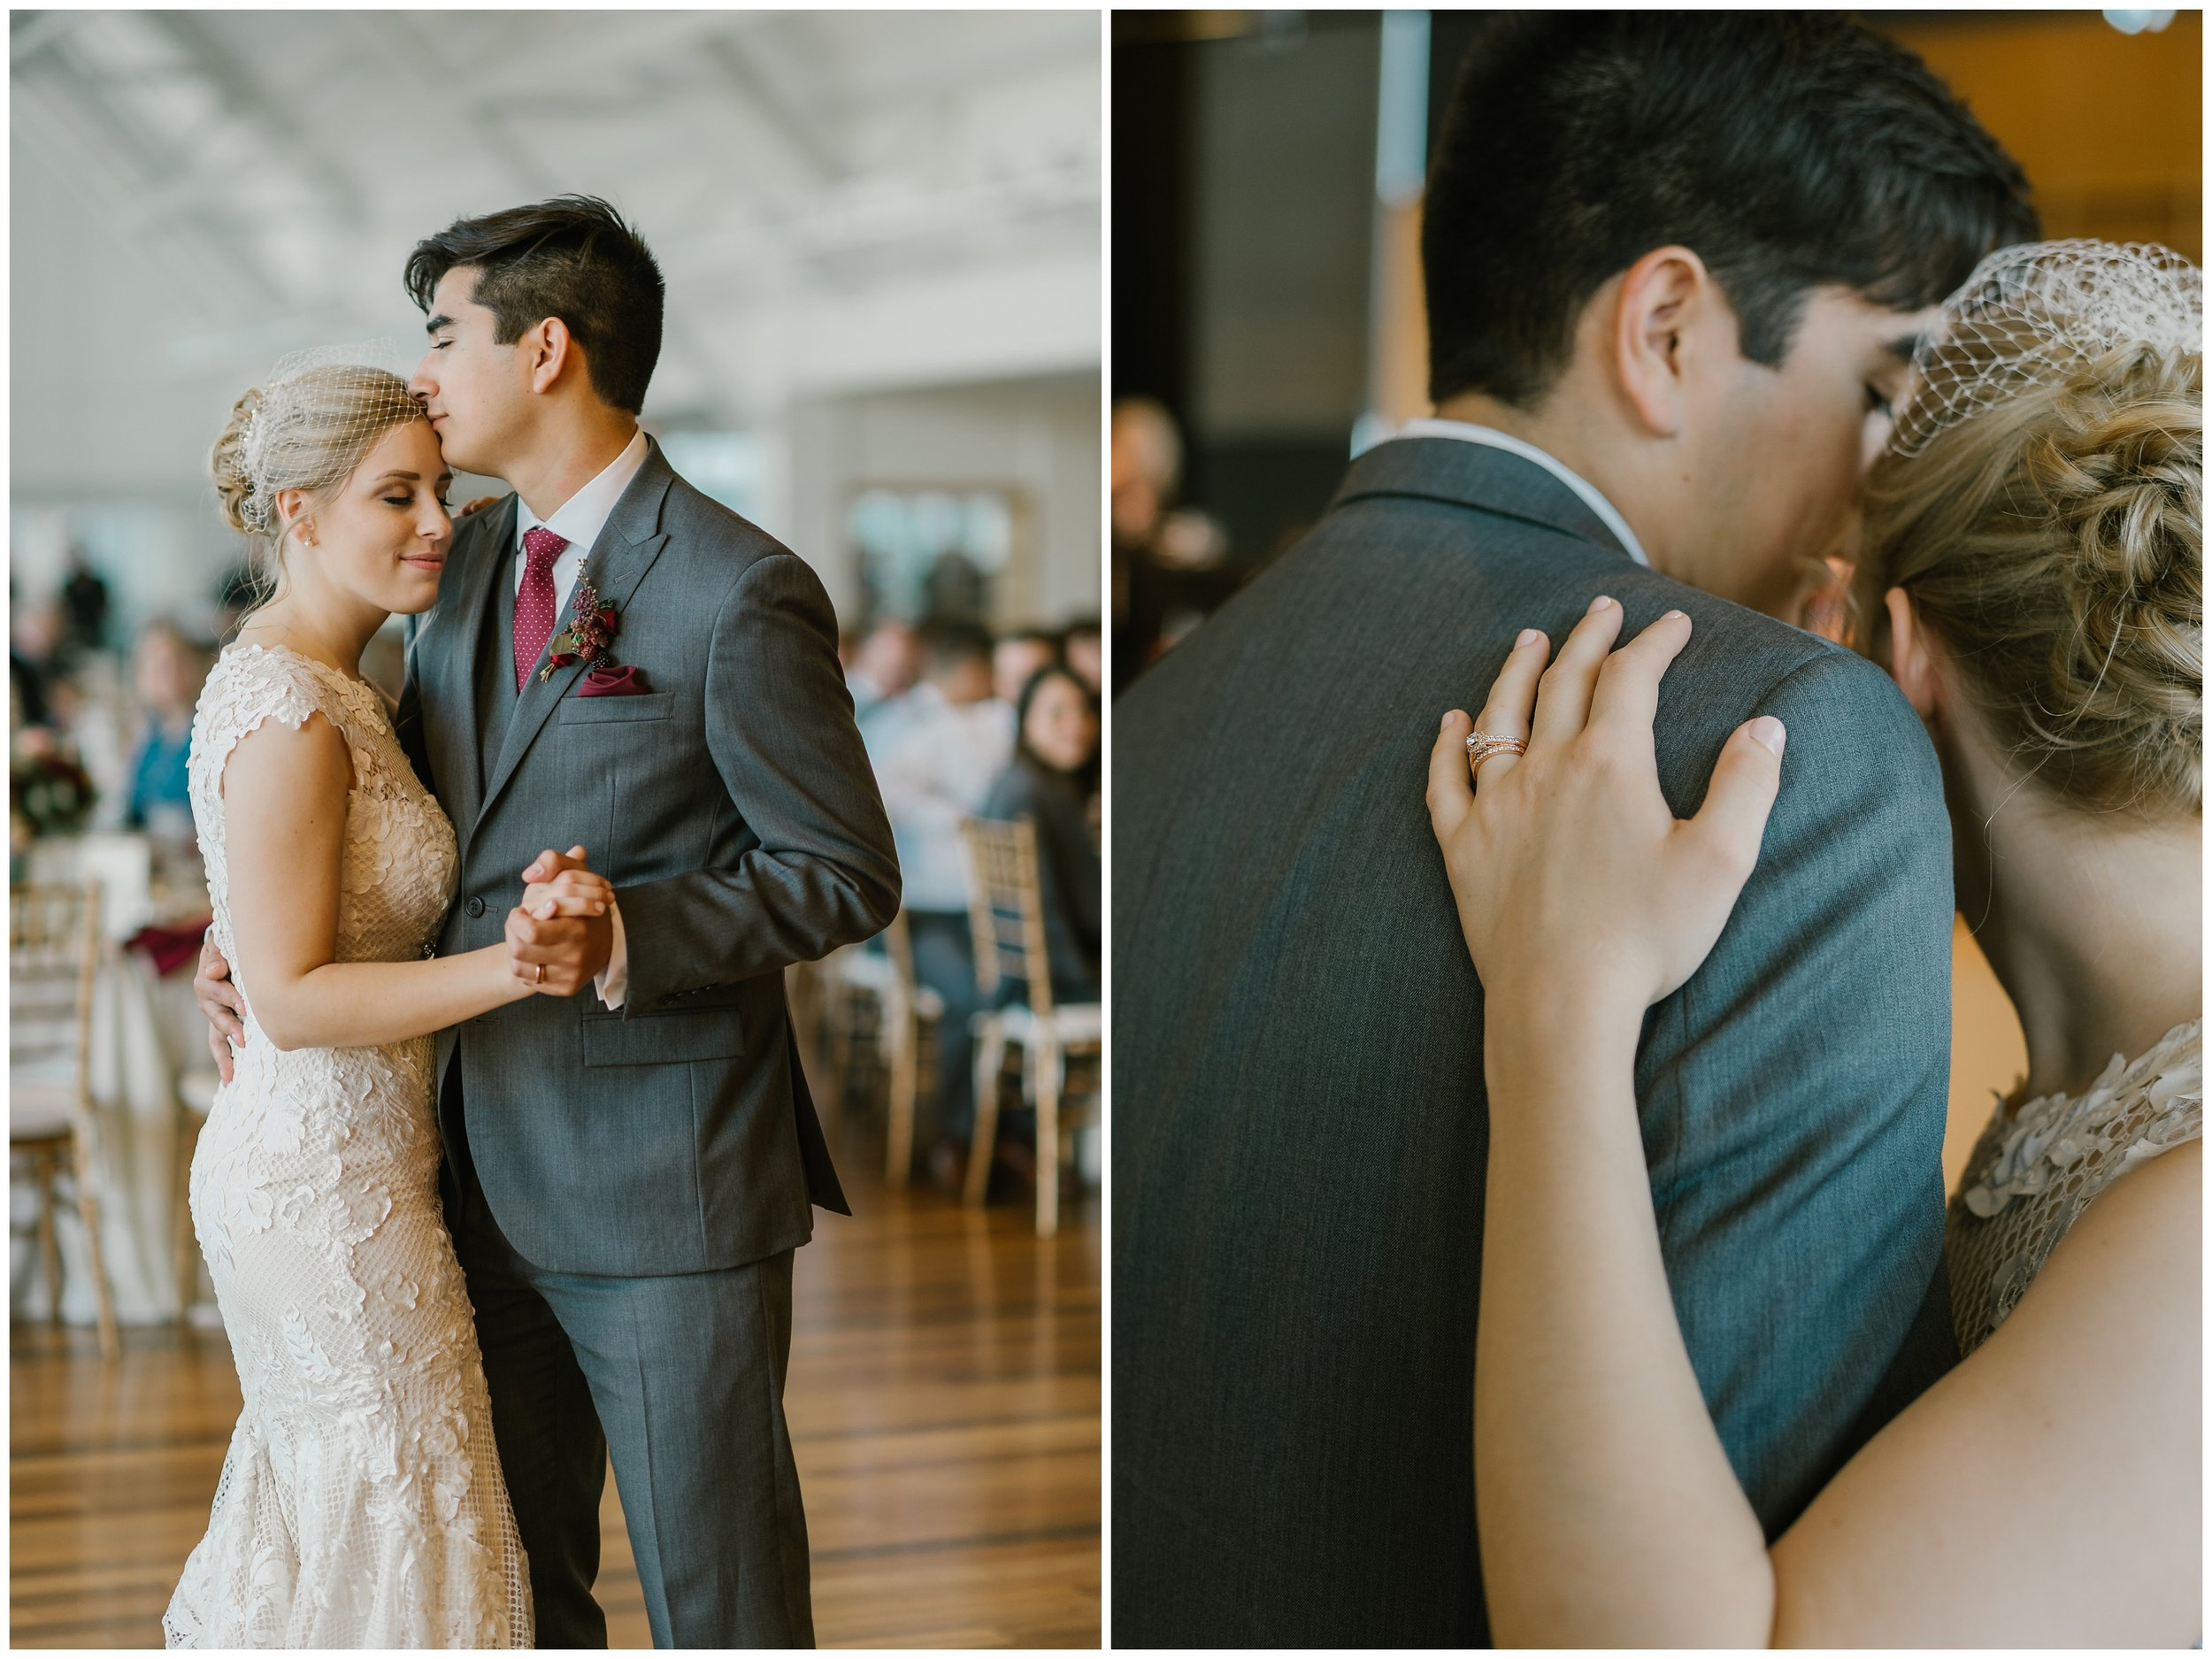 Rebecca_Shehorn_Photography_Indianapolis_Wedding_Photographer_7371.jpg